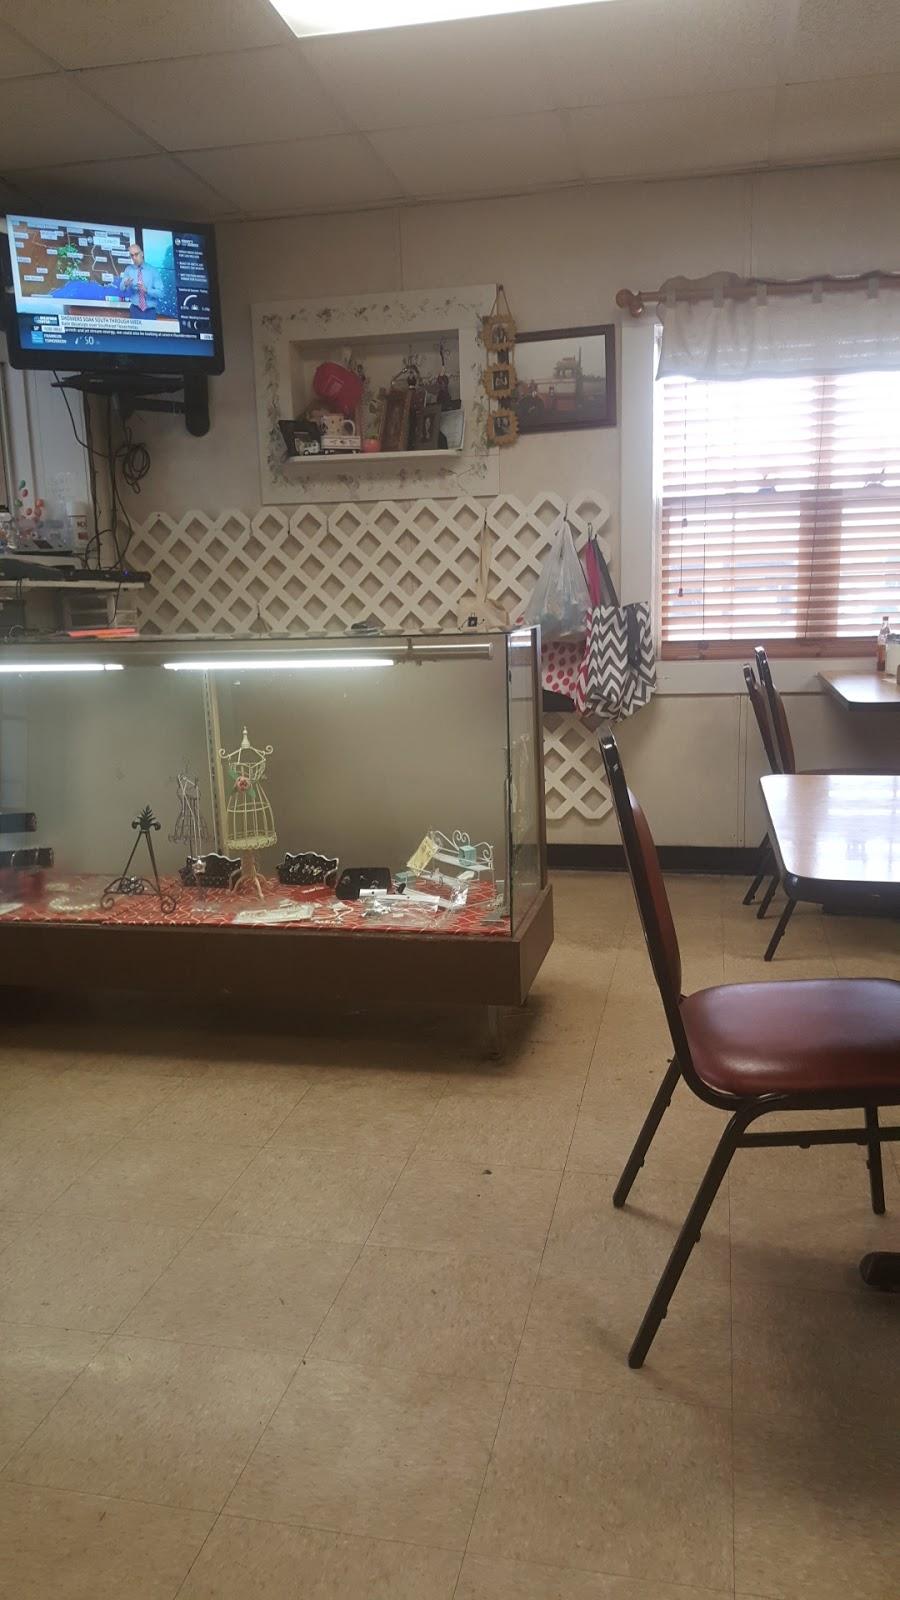 Lil Miss Emilys Cafe | restaurant | 426 N 2nd St, Pulaski, TN 38478, USA | 9313639605 OR +1 931-363-9605